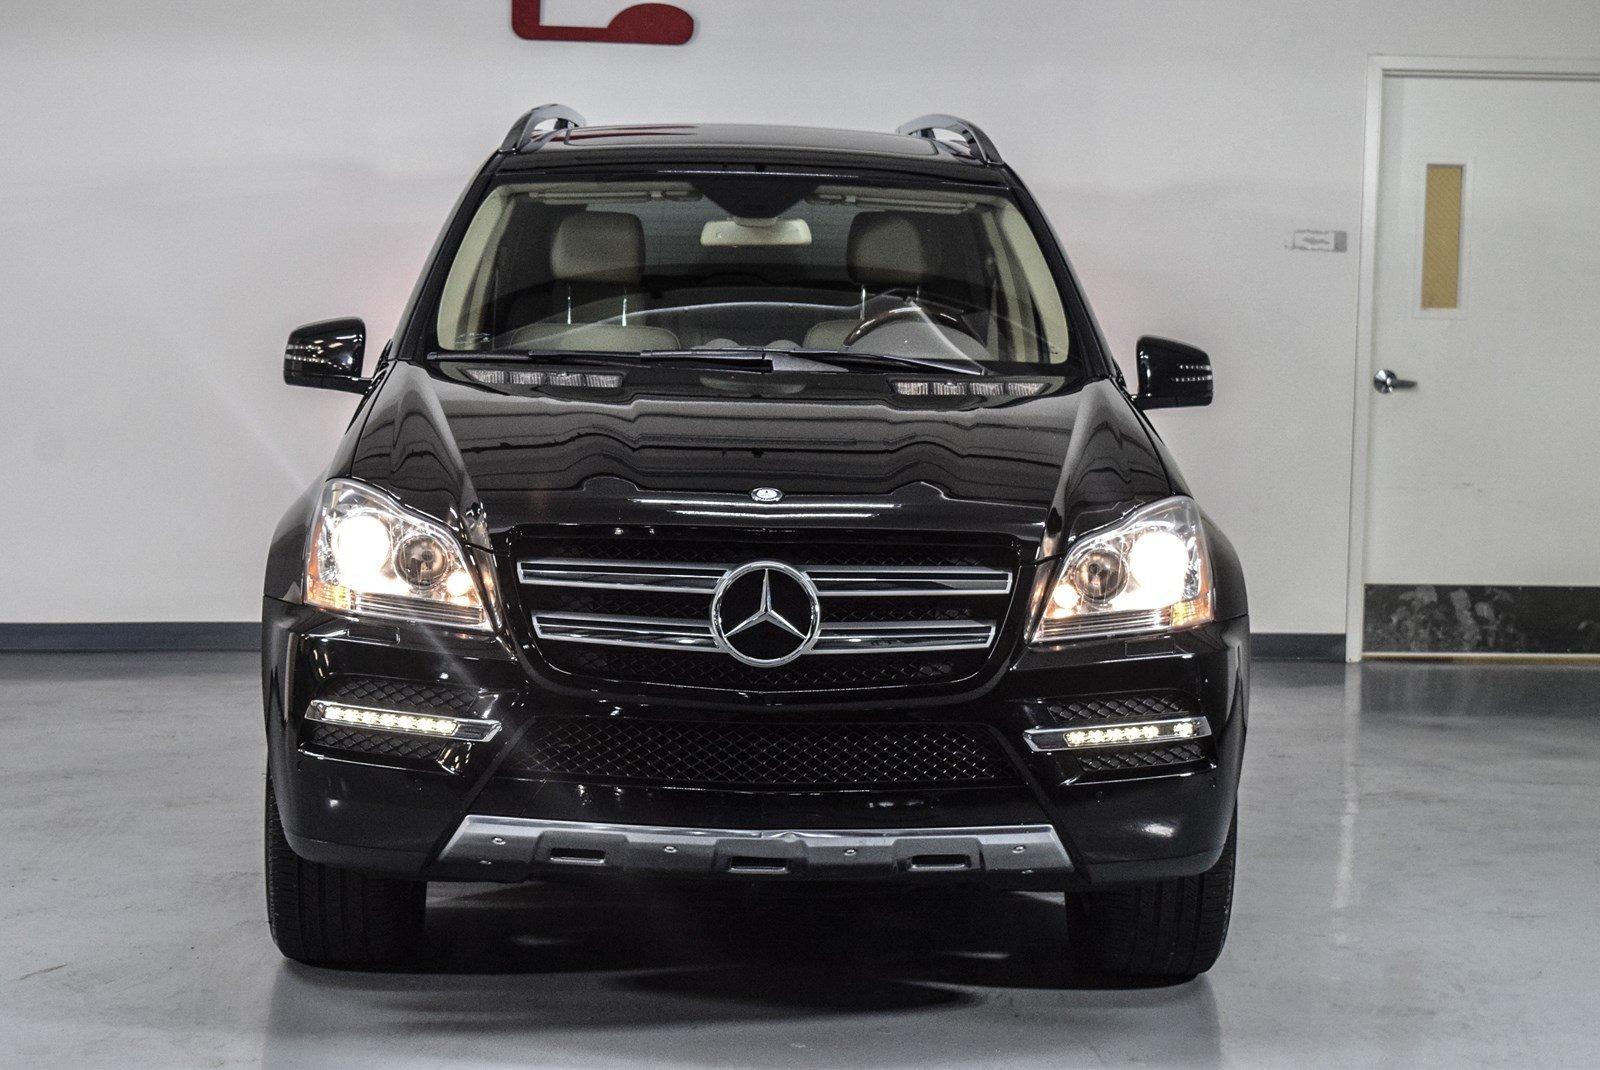 2012 Mercedes Benz Gl Class Gl450 Stock 775358 For Sale Near Fuse Box Ga Used Marietta